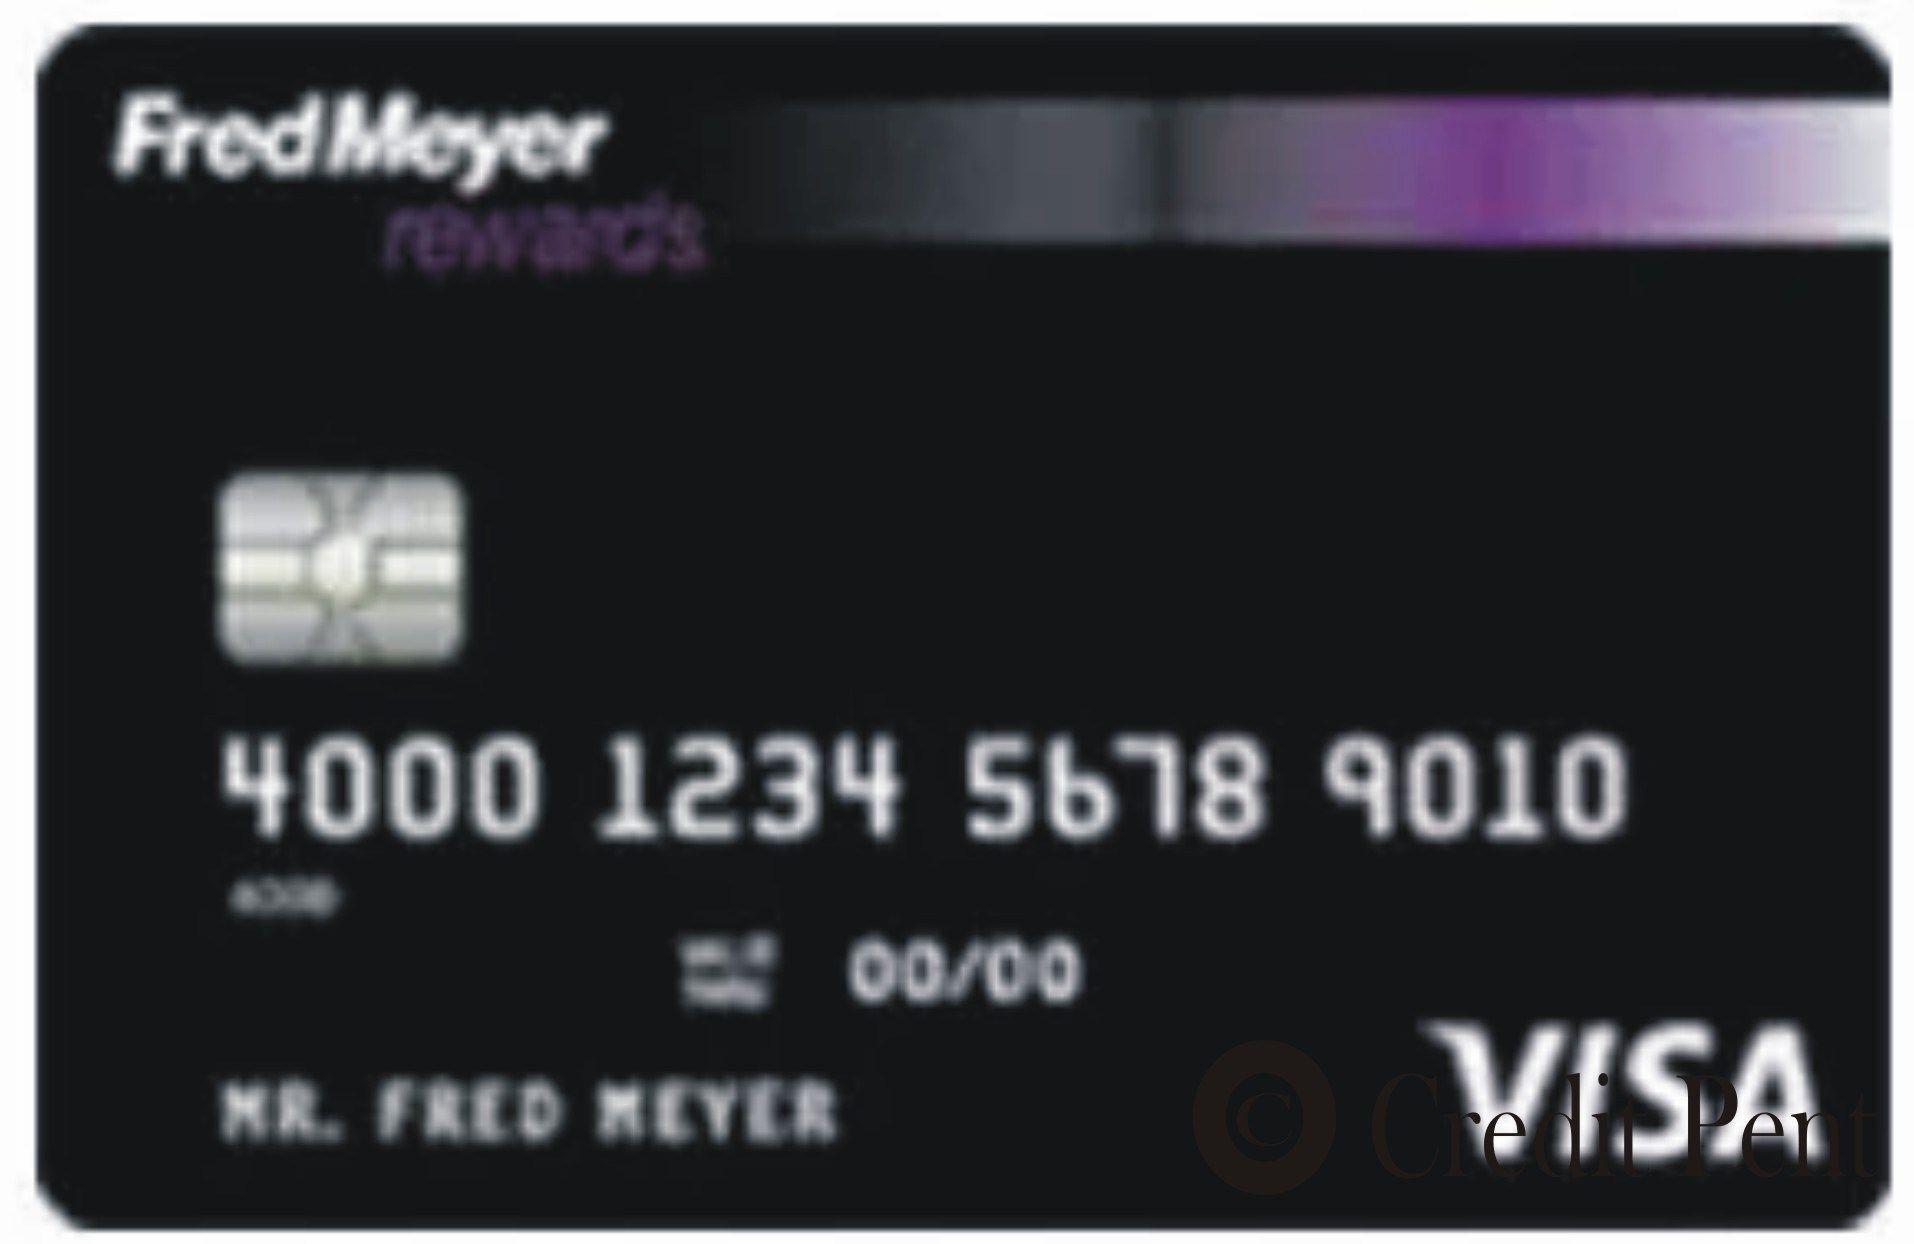 Fred Meyer Rewards Mastercard Login Credit Card Fred Meyer Rewards Credit Cards